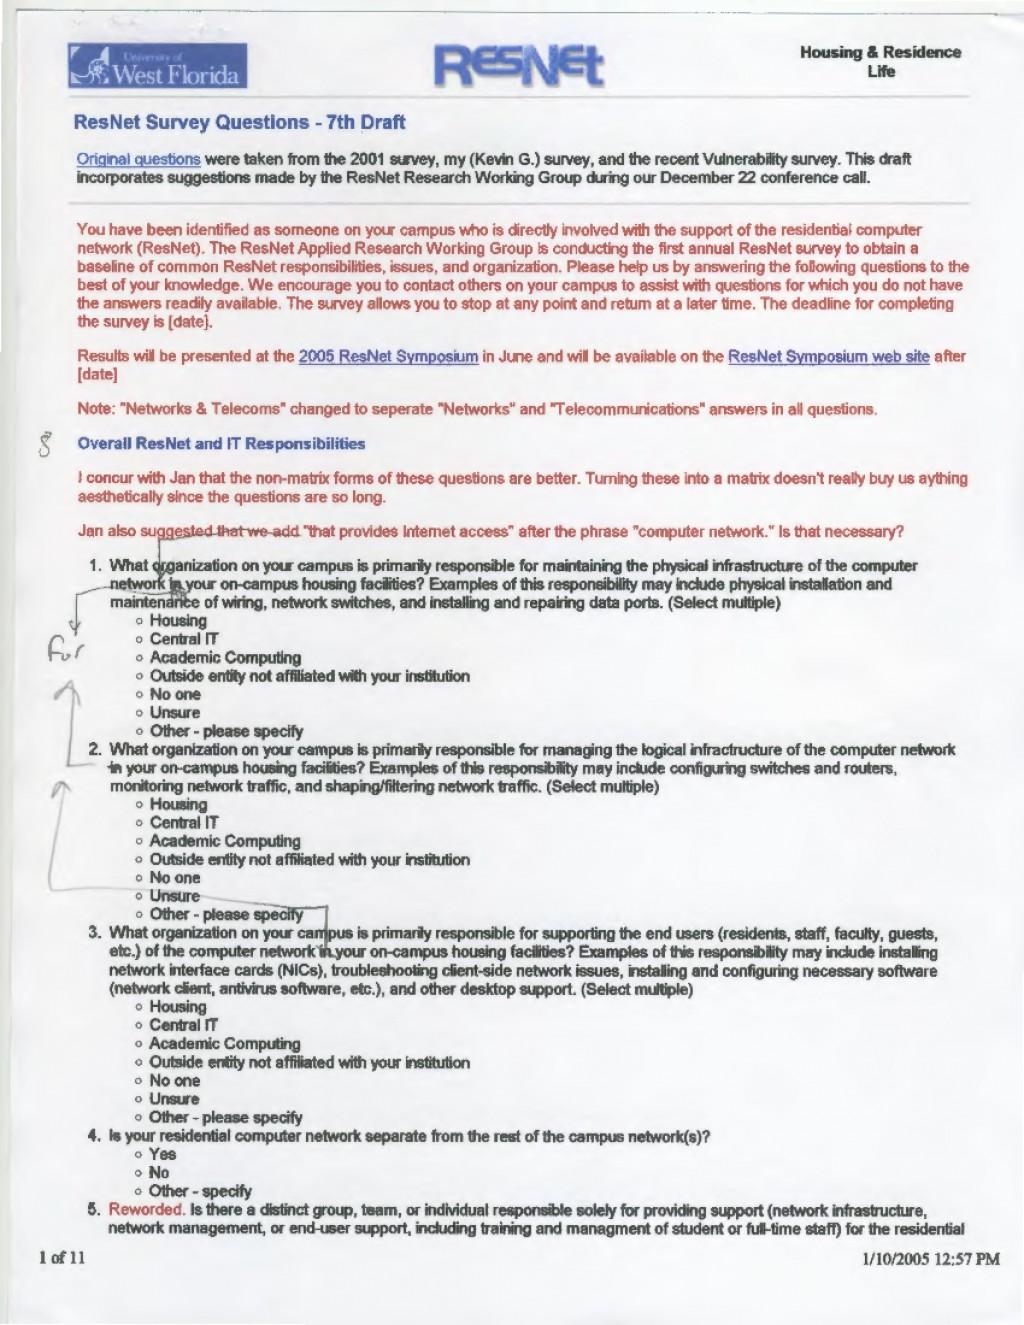 008 Essay Example Checker Free Online Originality Check Turnitin Macquarie College Resnet Survey Draft Amazing Sentence Grammar Plagiarism Document Large